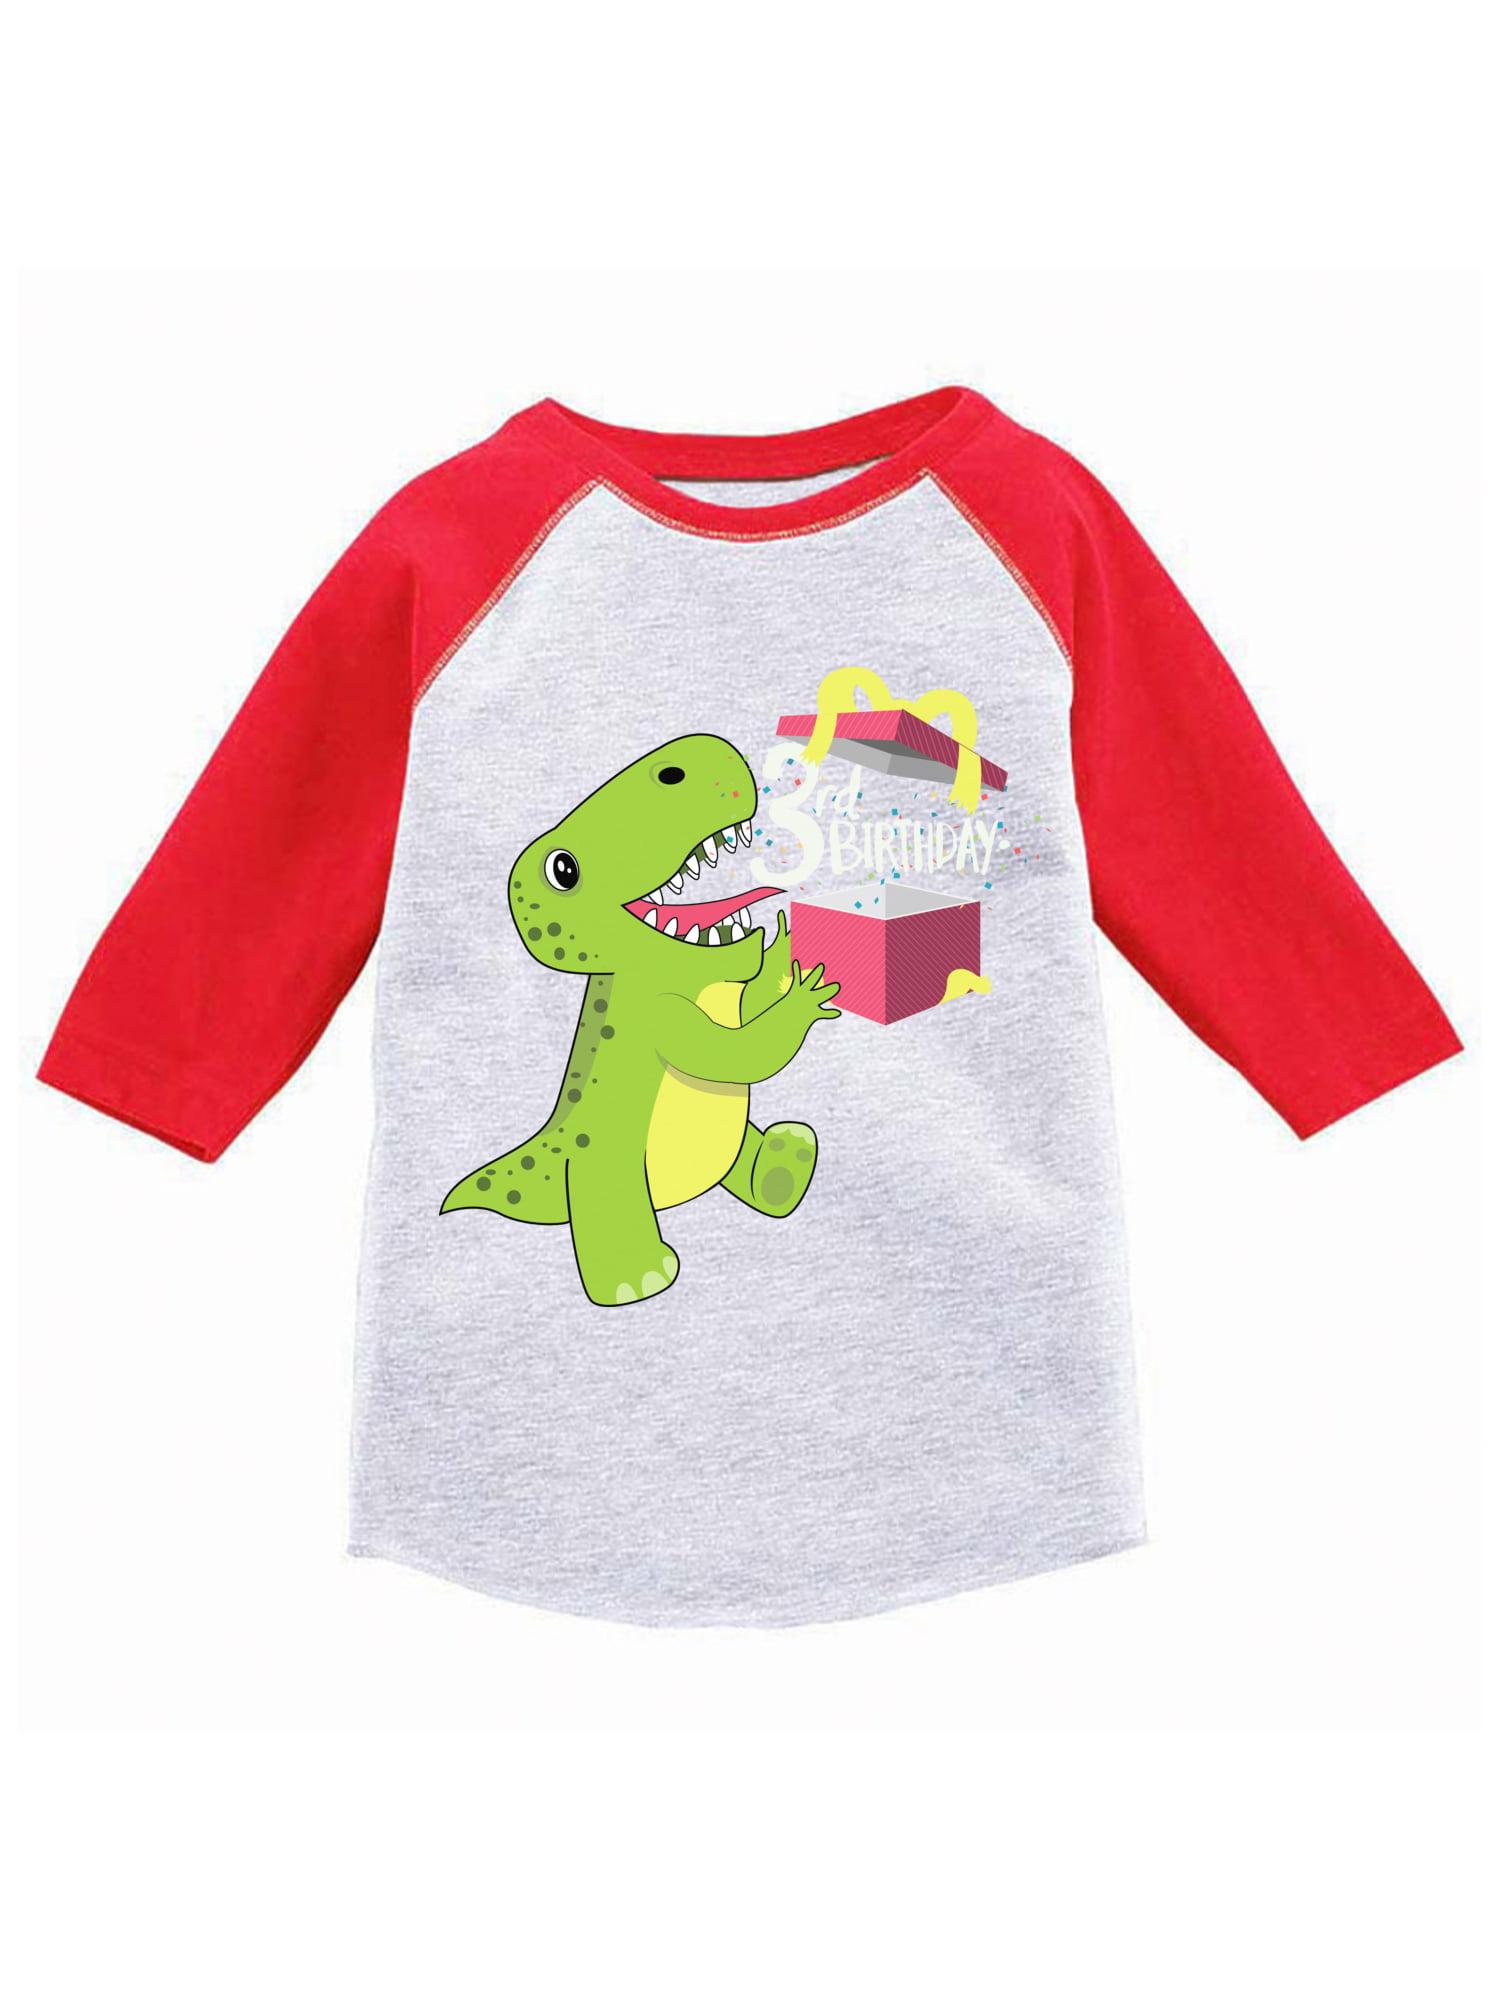 Awkward Styles Dinosaur Birthday Toddler Raglan Jersey Shirt For 3 Year Old 3rd Gifts Boy Baseball Girl T